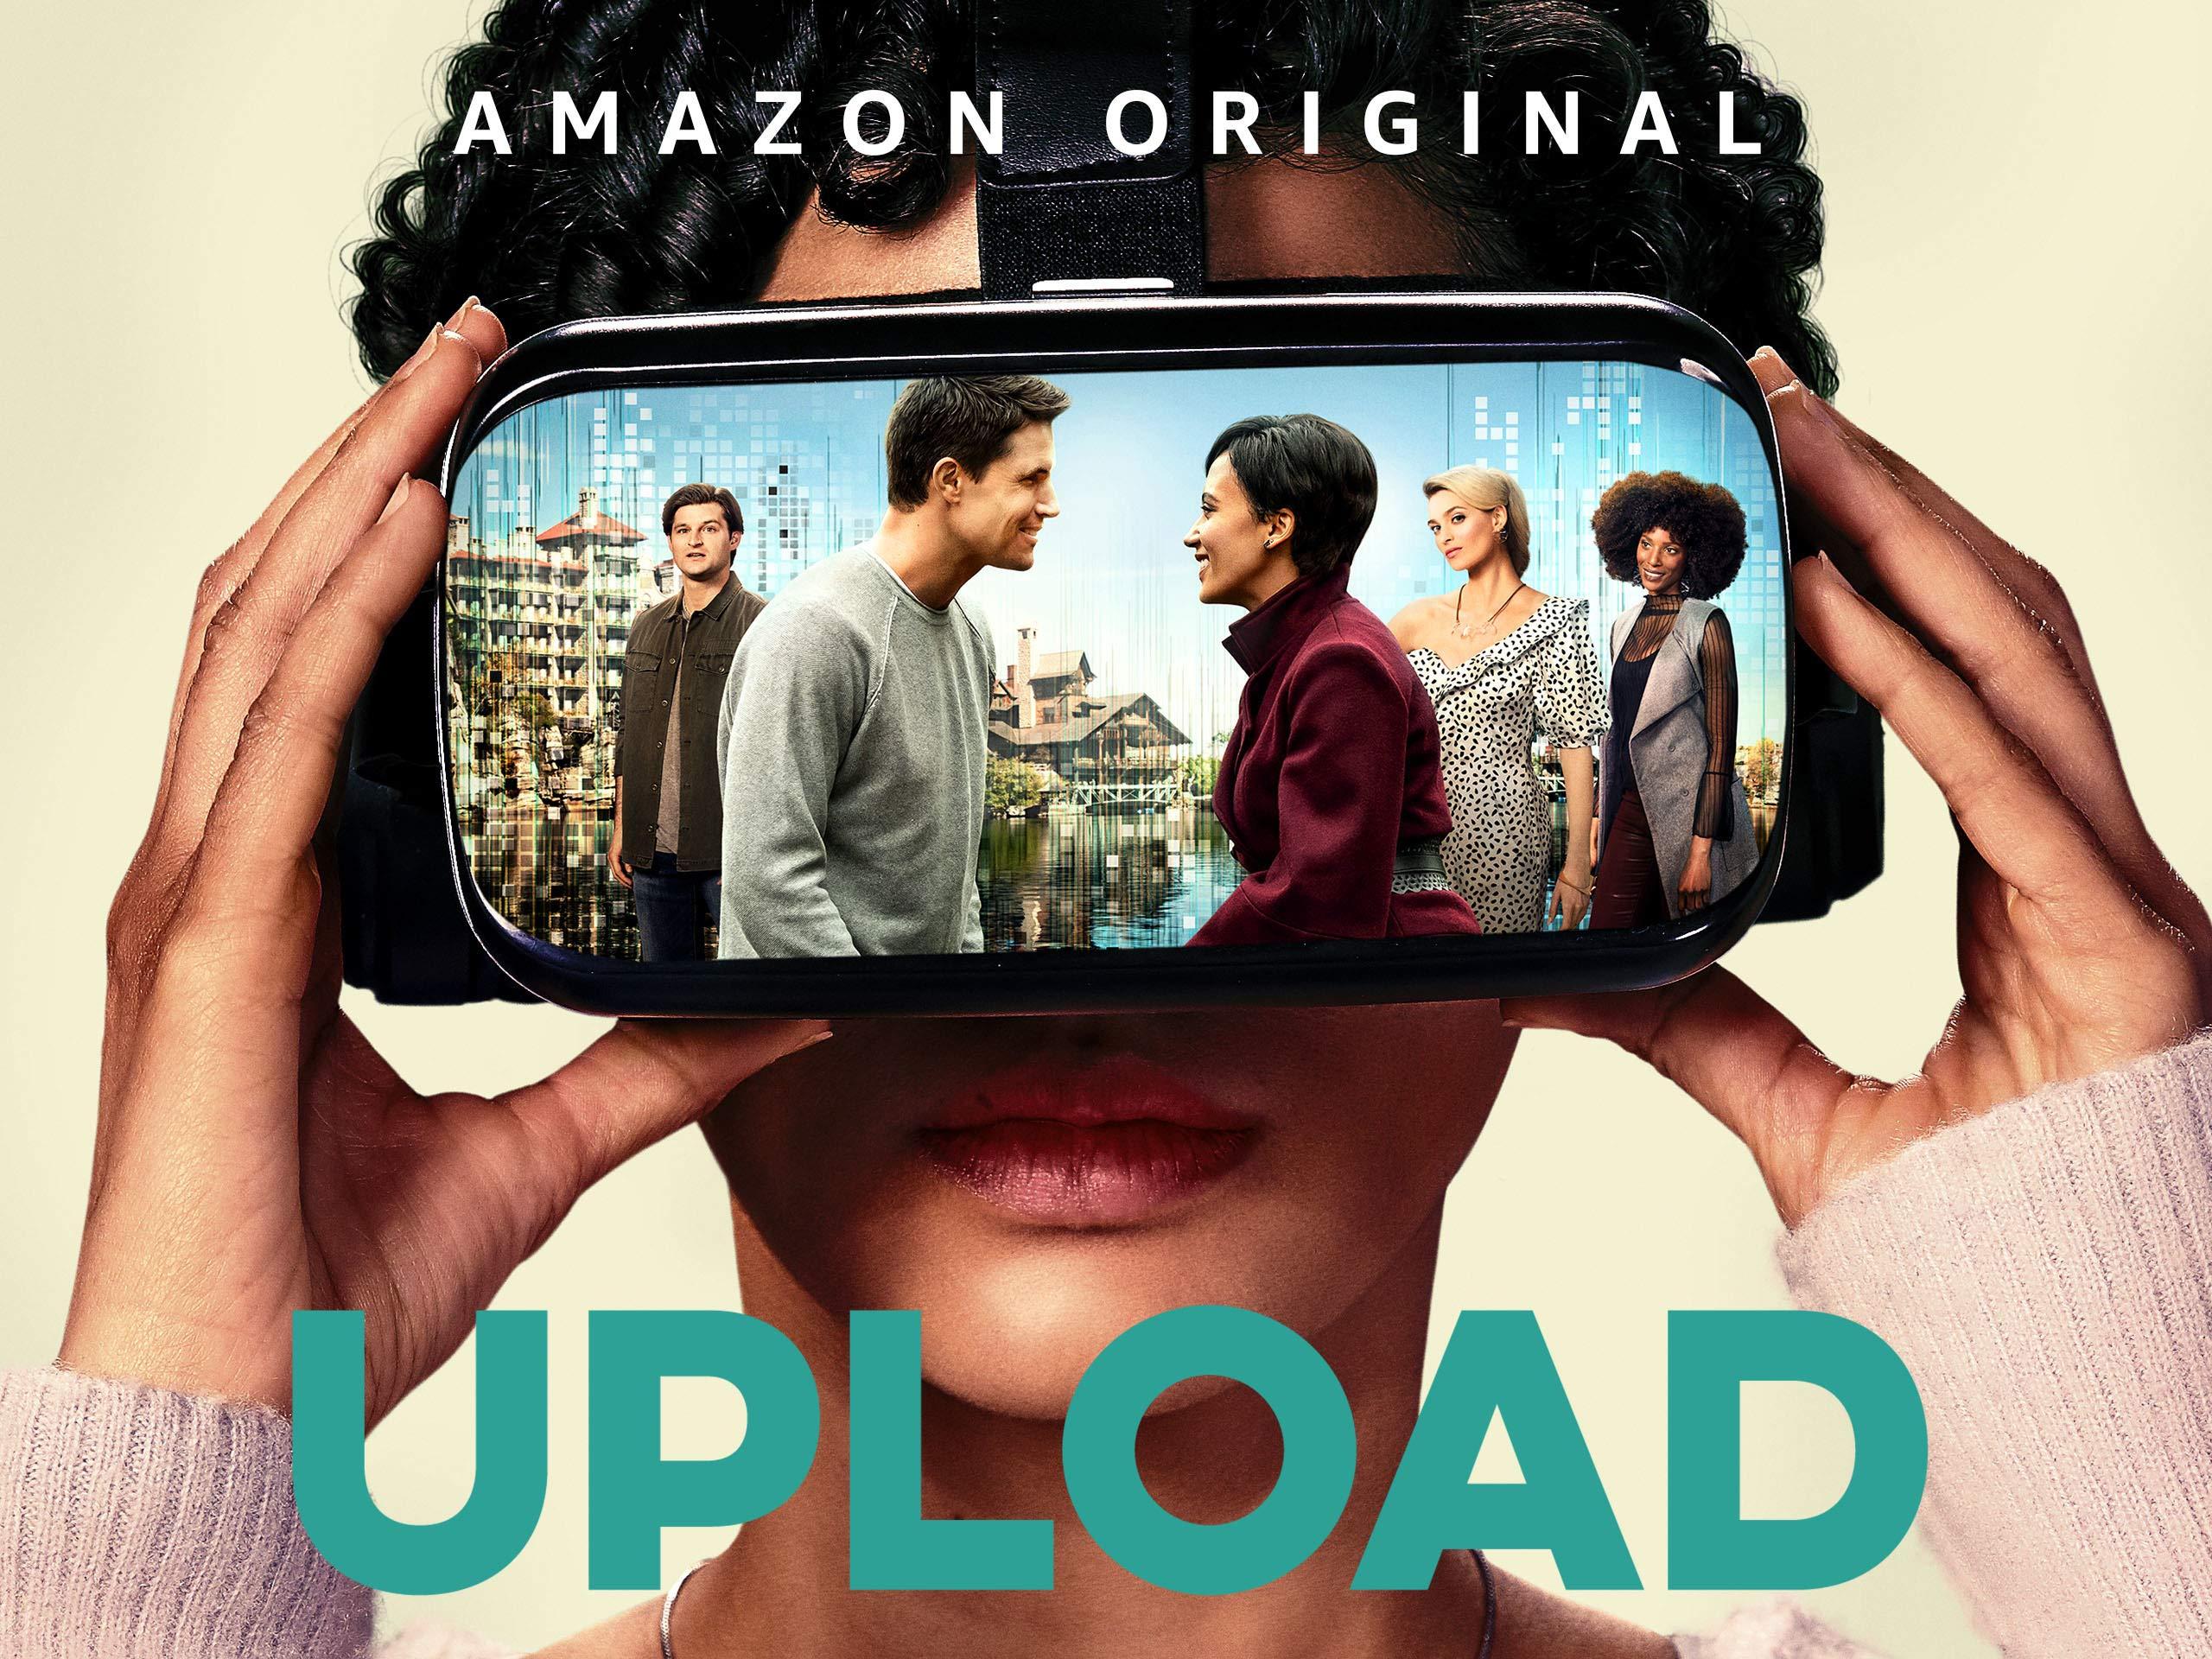 Amazon.com: Watch Upload - Season 1 | Prime Video